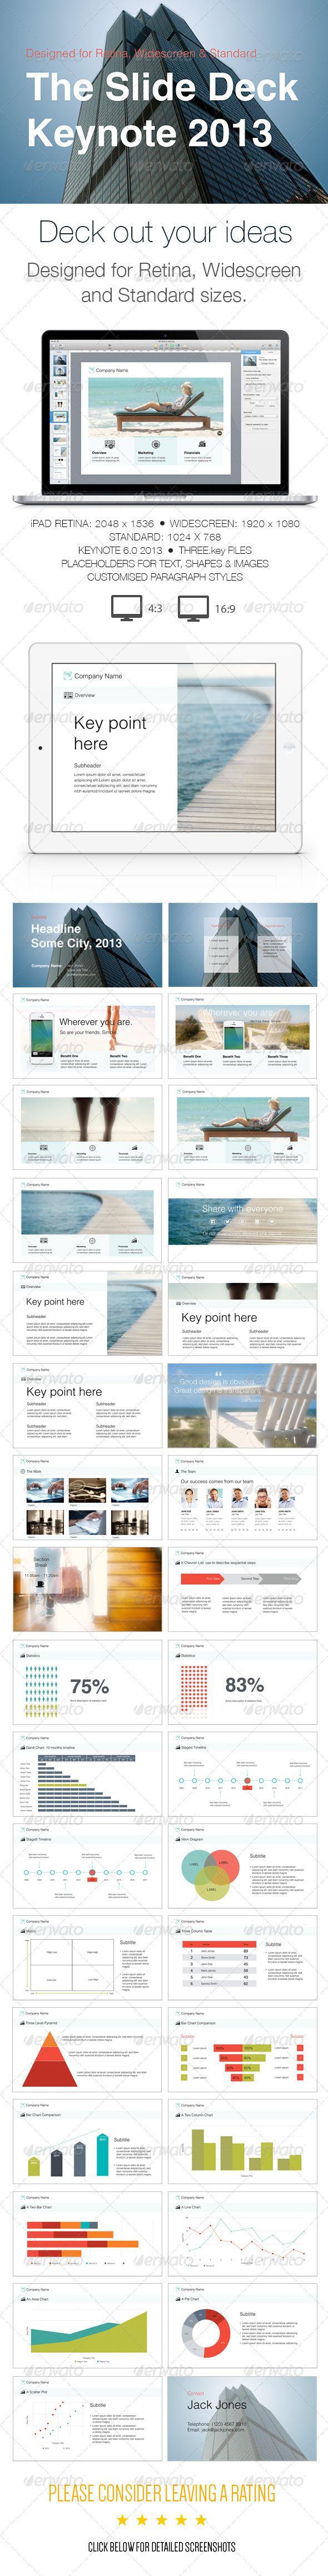 The Slide Deck- A Keynote Template | Keynote theme / template